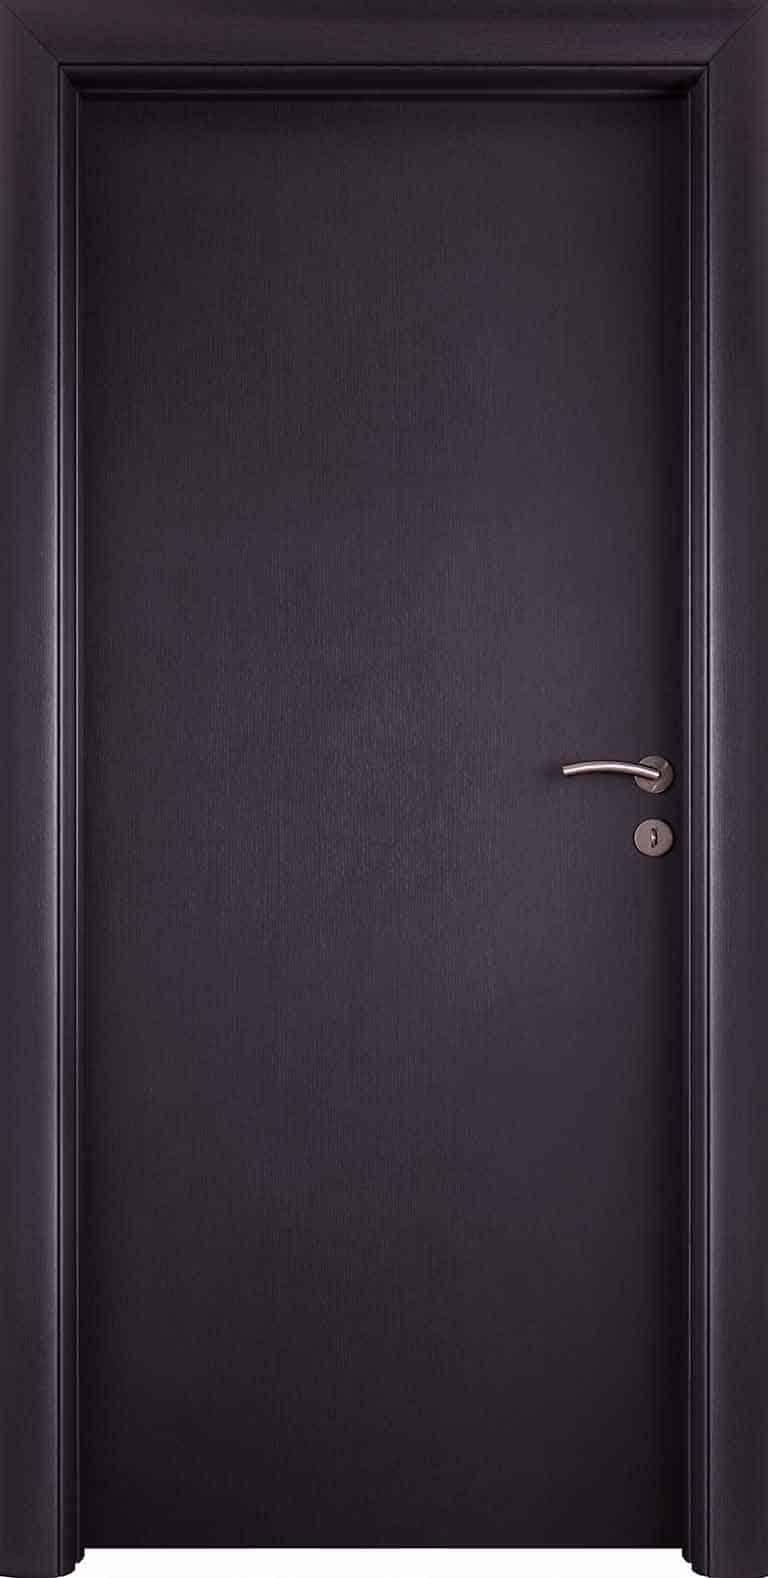 protuprovalna vrata forlux grafit